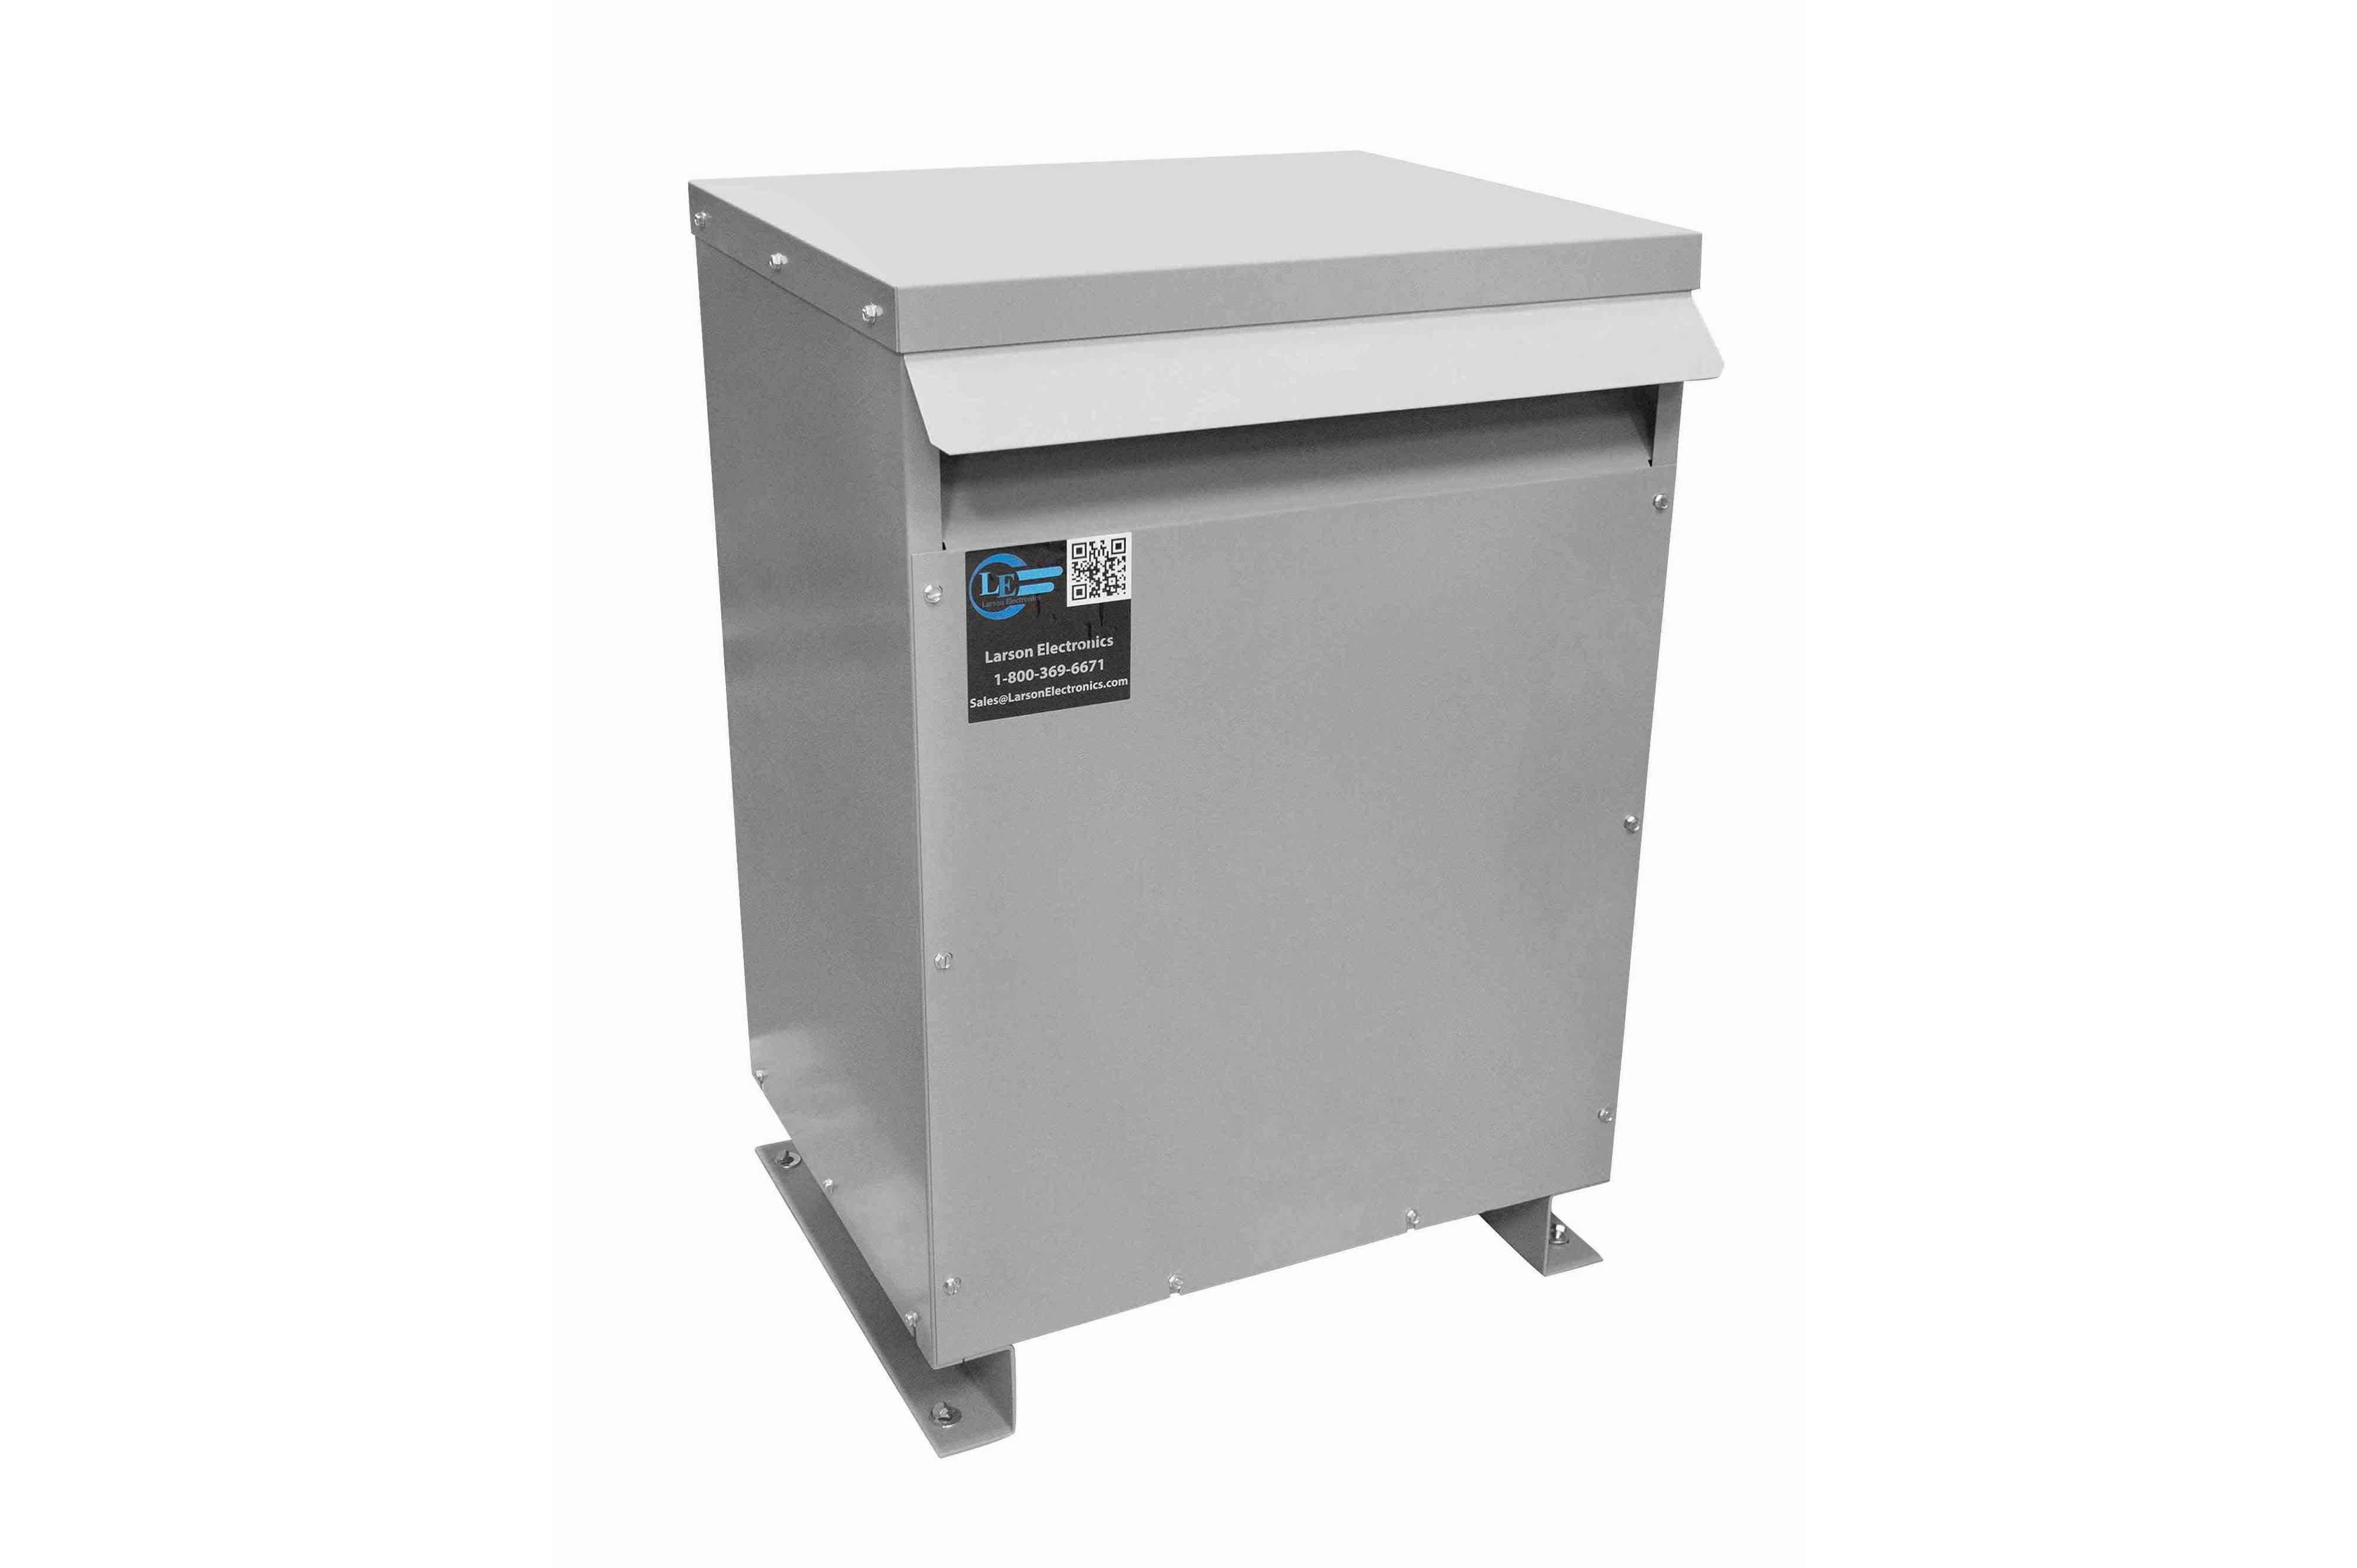 90 kVA 3PH Isolation Transformer, 460V Wye Primary, 575V Delta Secondary, N3R, Ventilated, 60 Hz